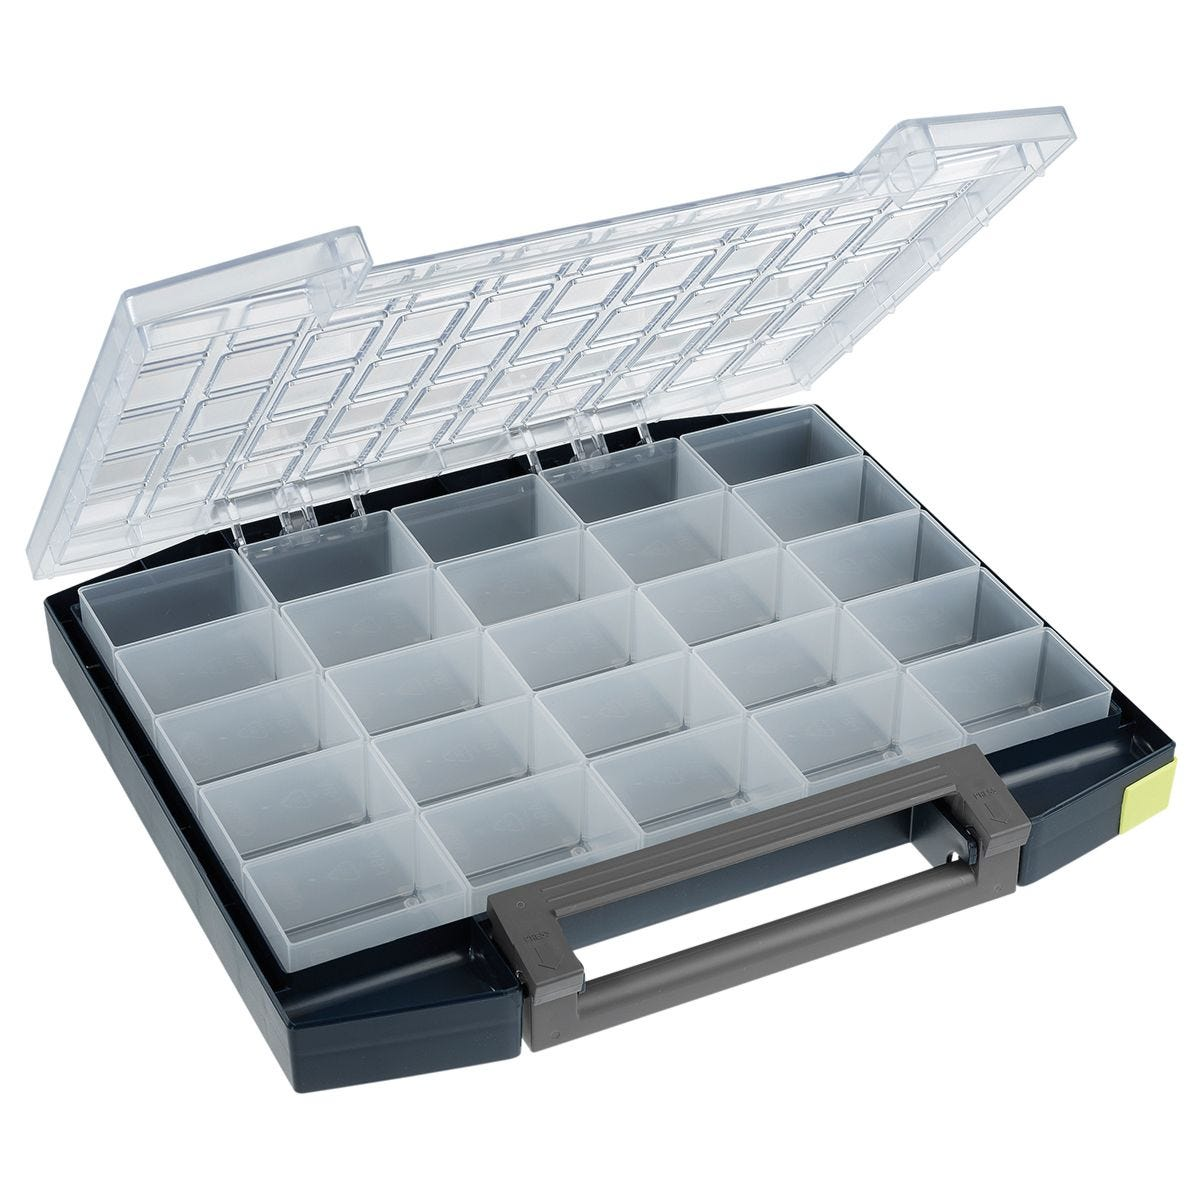 Raaco Boxxser 55 5 x 10 Pro Organiser Case - 25 Inserts